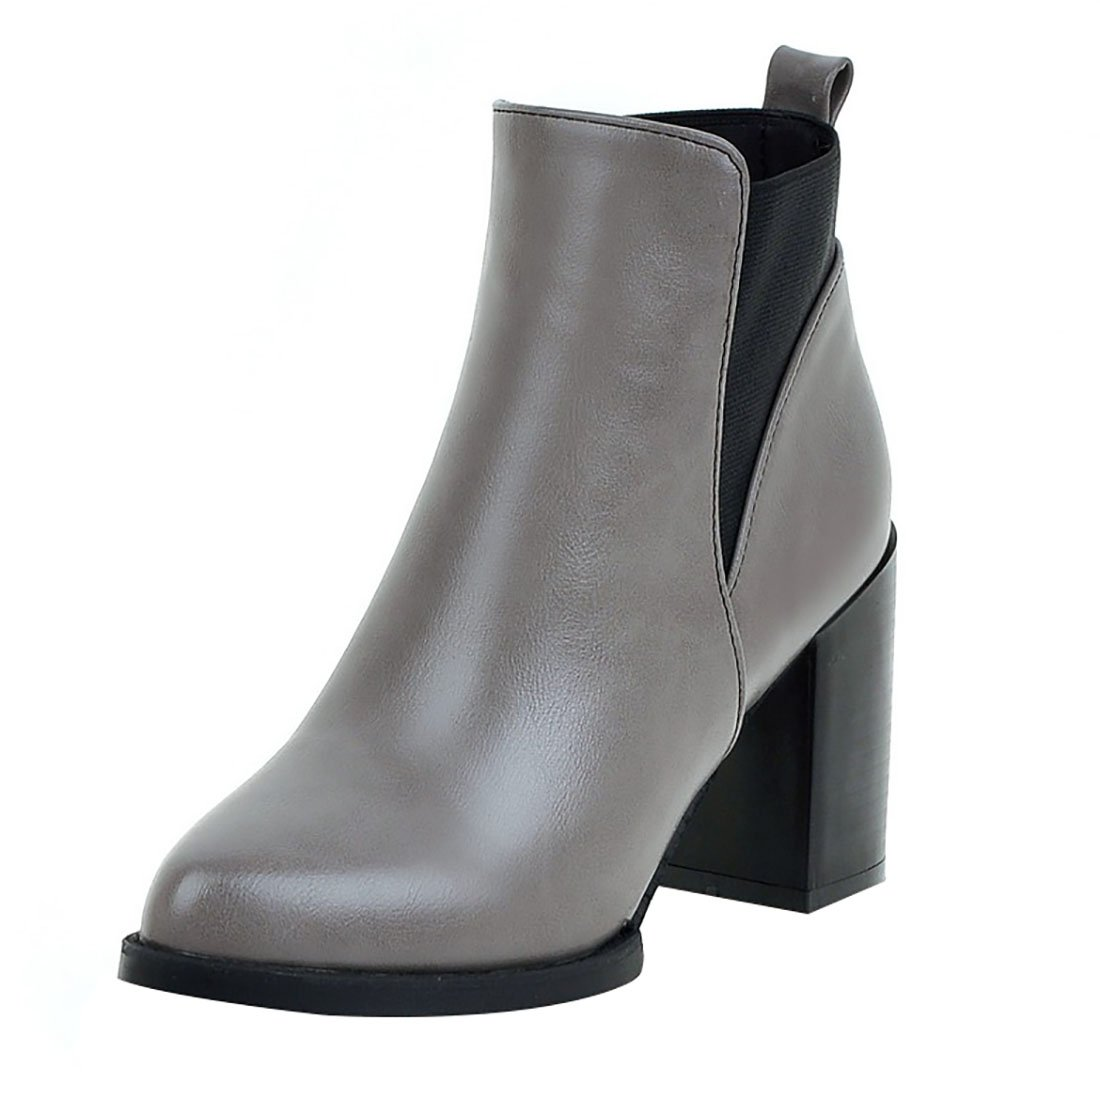 UH Damen Blockabsatz Chelsea Boots Chunky High Heels Stiefeletten mit Spitze Herbsr Winter Schuhe  34 EU Grau